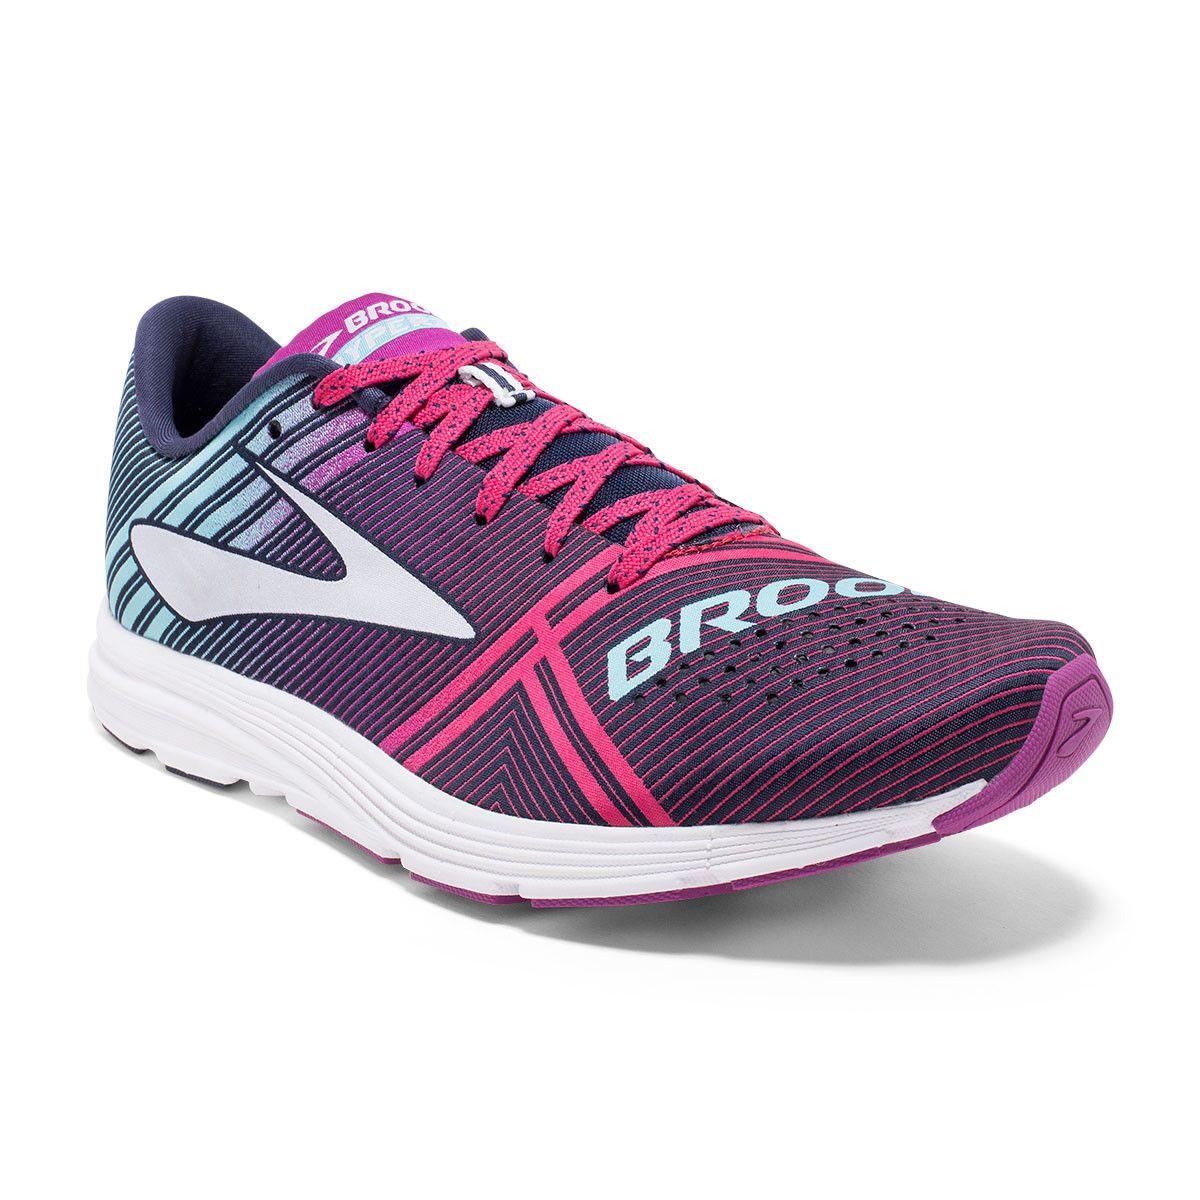 c01fdbbc6c3 Hyperion Brooks running shoes